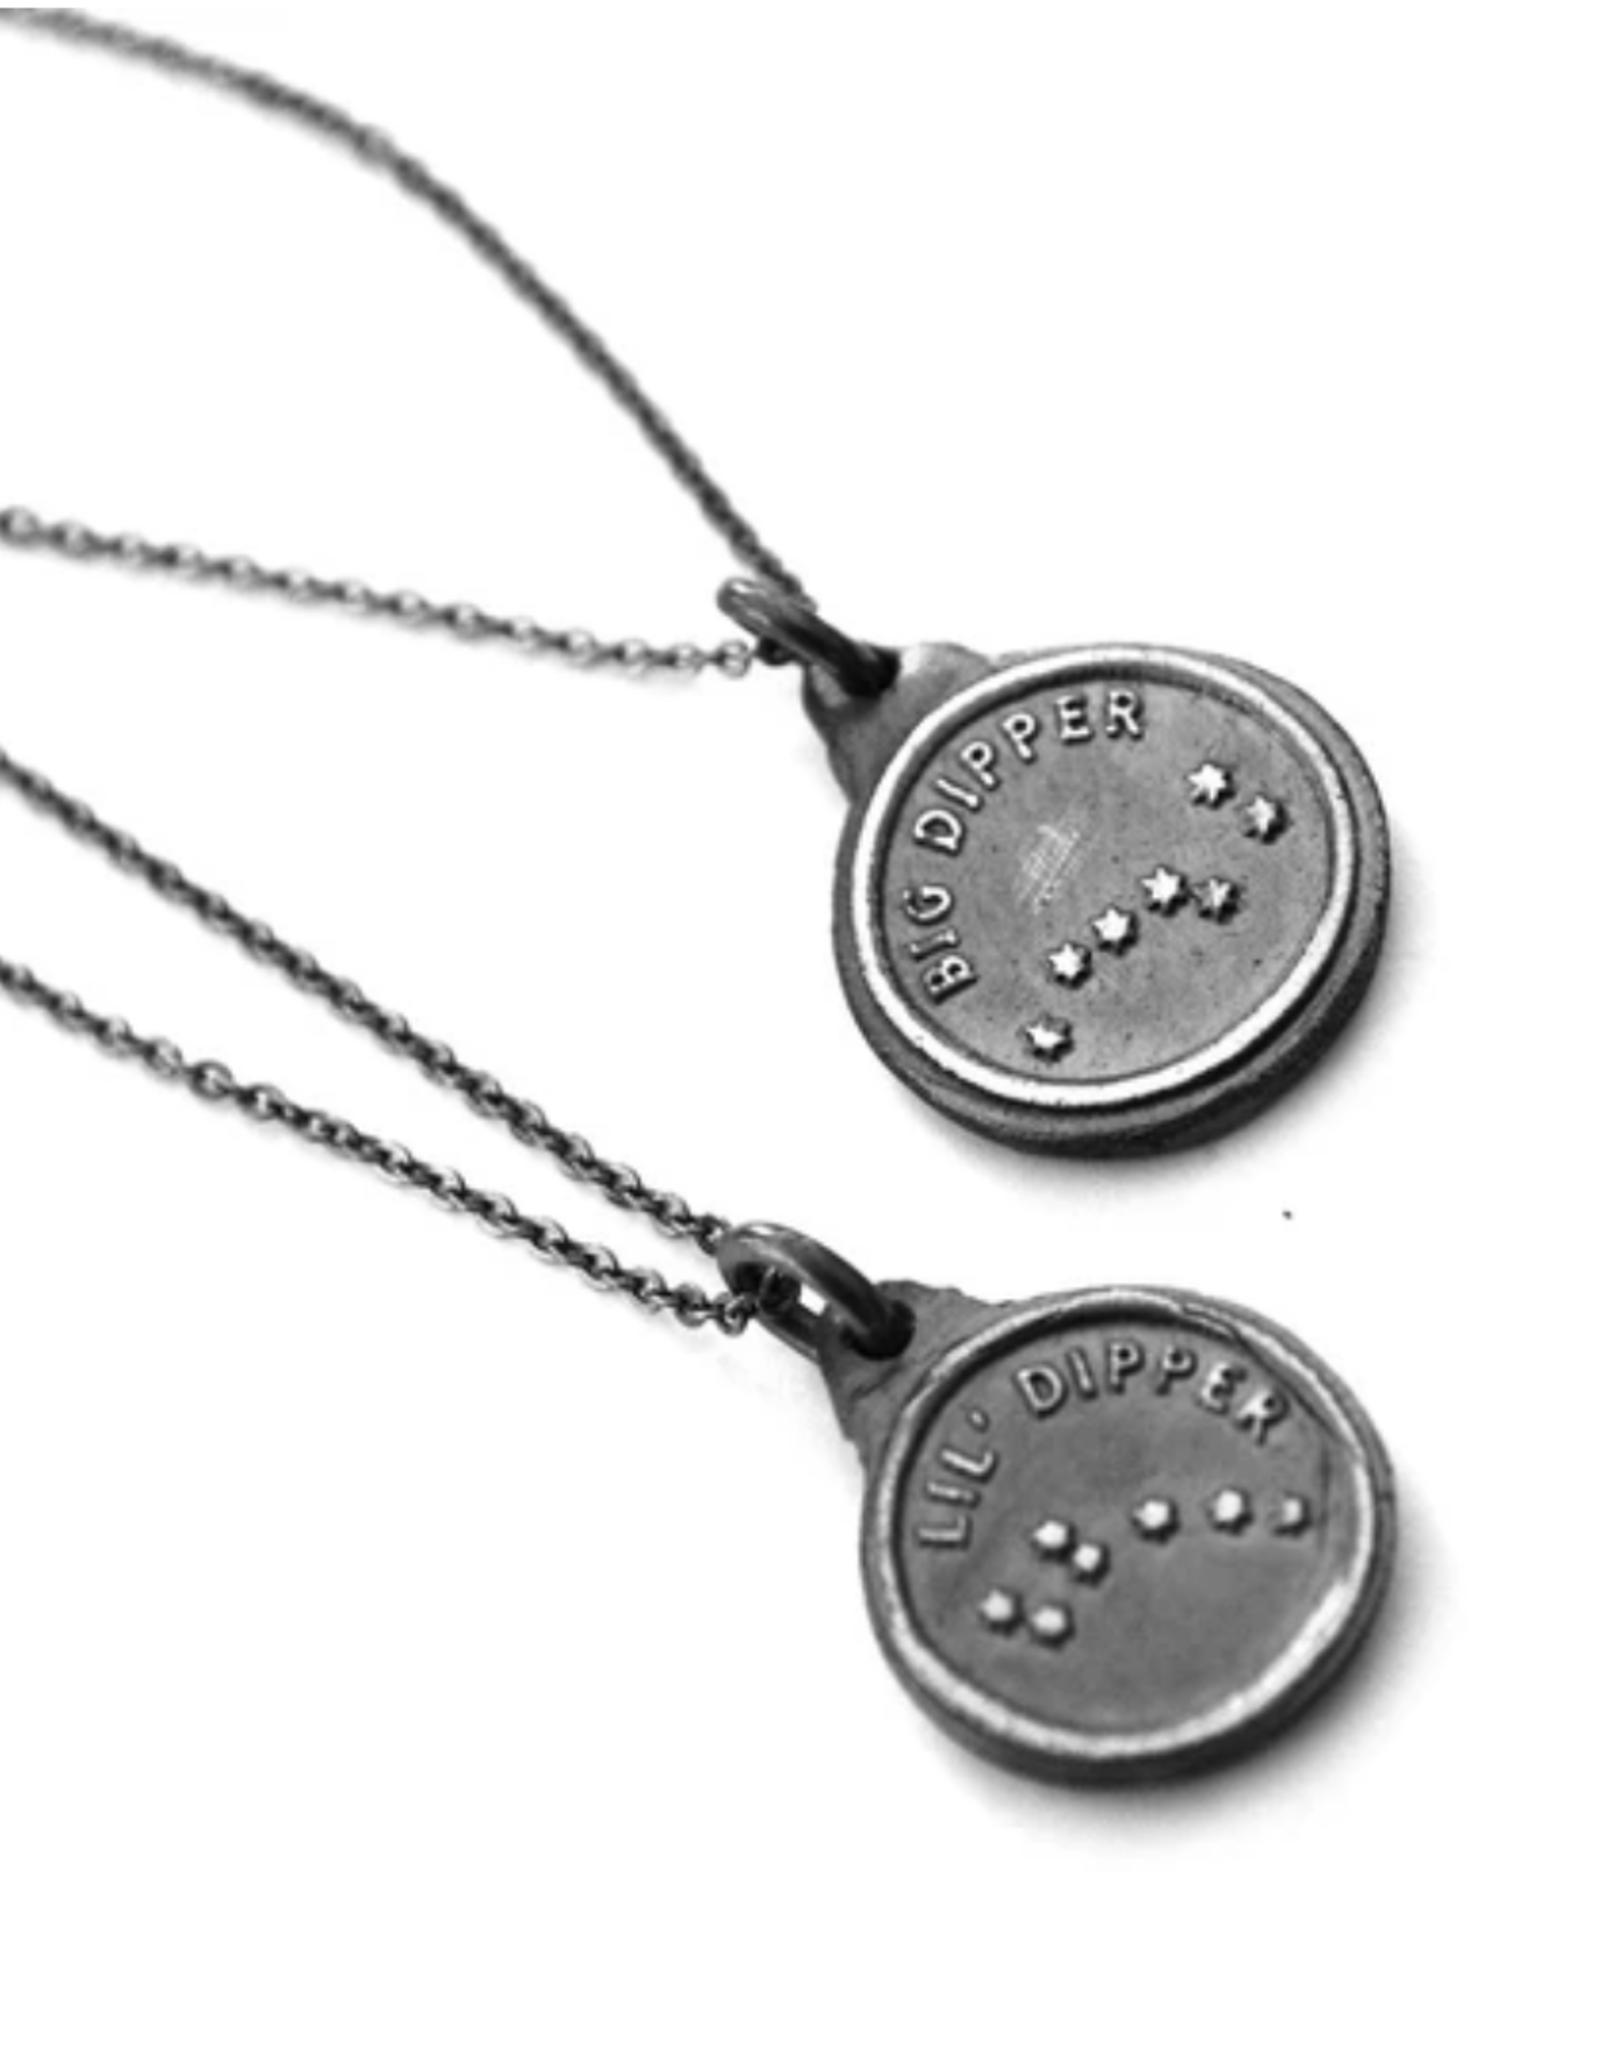 Big Dipper & Little Dipper Set of 2 Necklaces